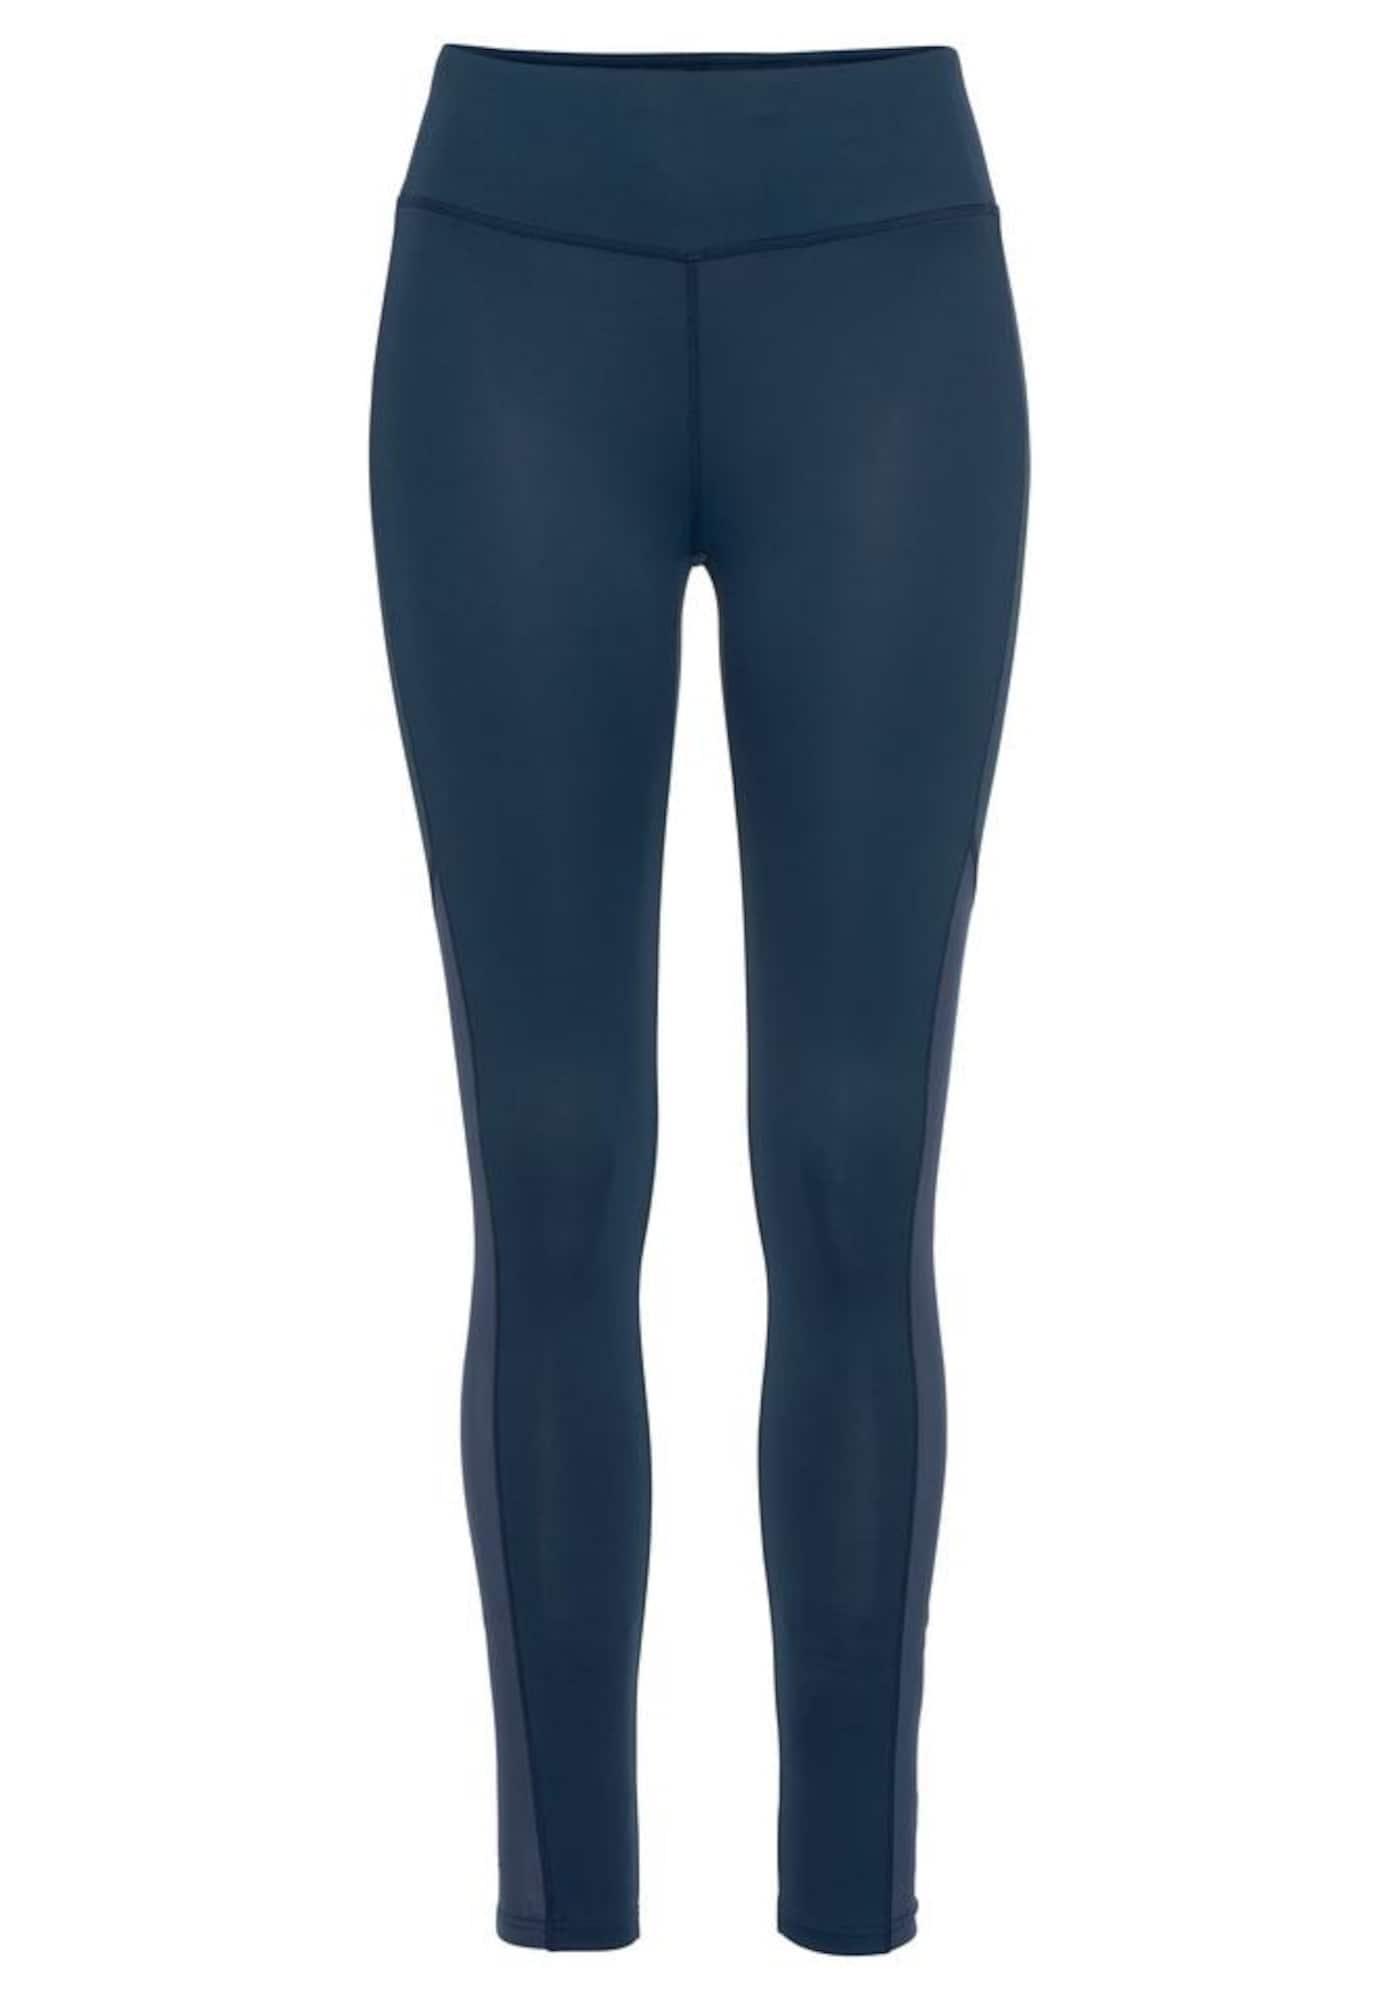 LASCANA ACTIVE Sportinės kelnės 'Like a Feather' tamsiai mėlyna jūros spalva